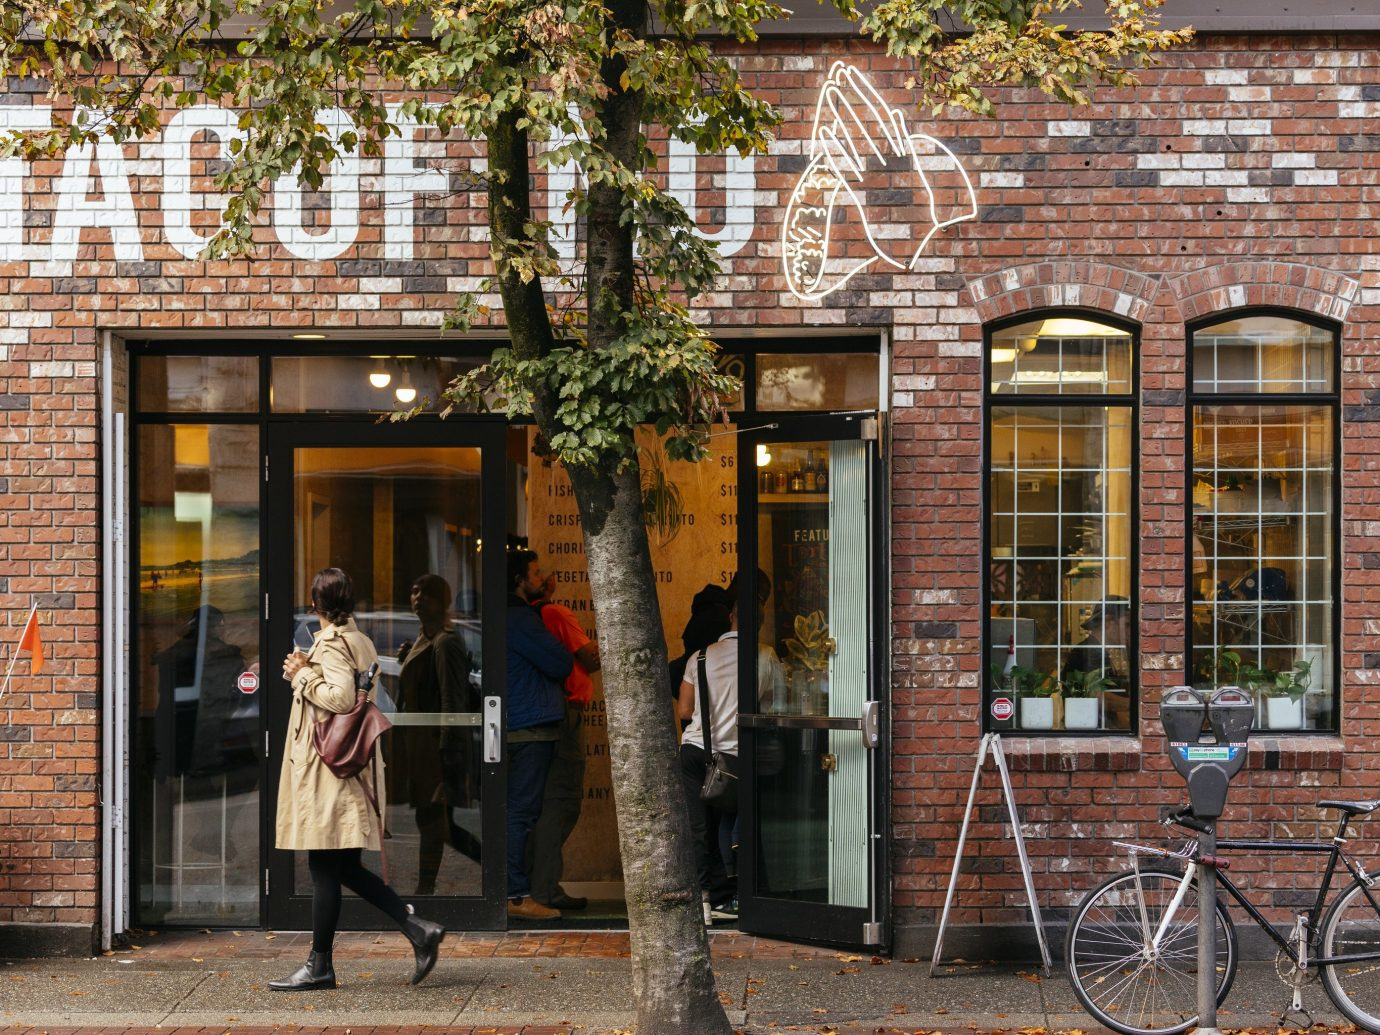 Trip Ideas building outdoor neighbourhood urban area road Town City sidewalk street brick Downtown facade infrastructure shopping